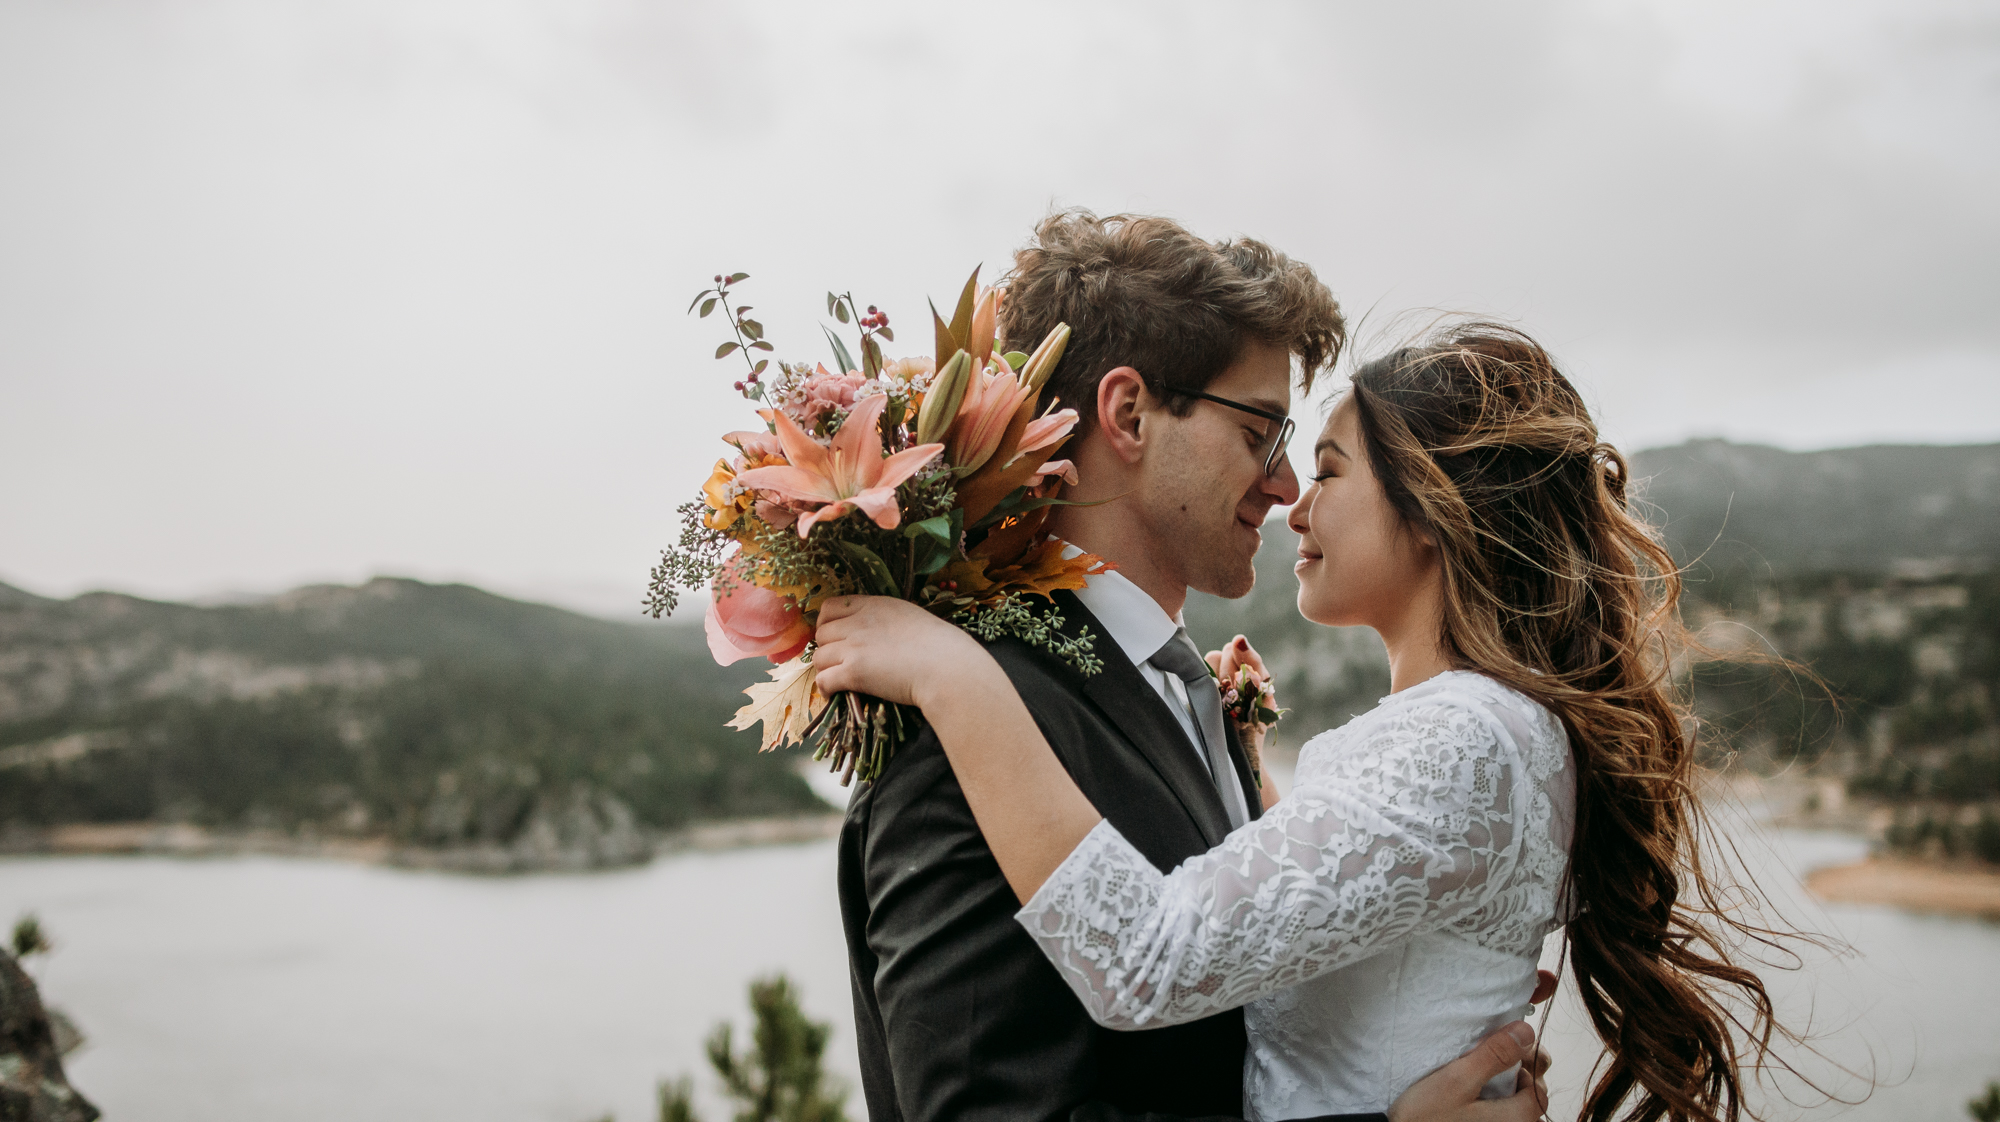 wild_earth_weddings_colorado_elopement_photographer_dogs_rocky_mountains-29.jpg